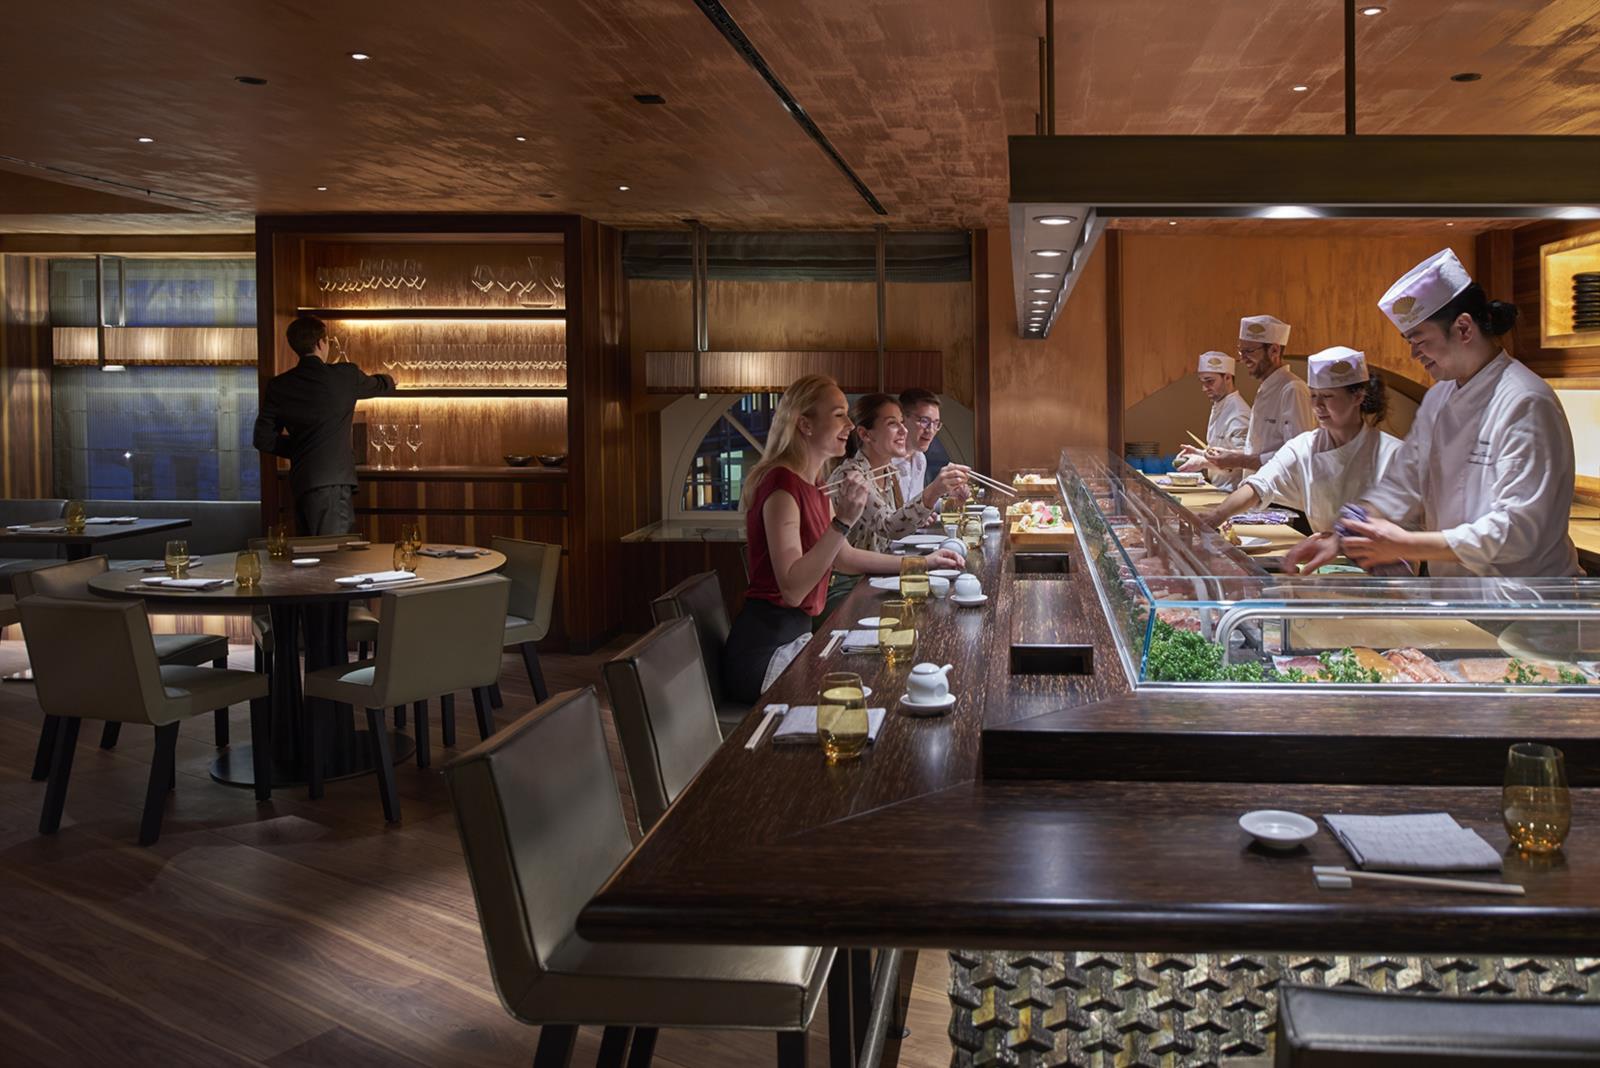 acheter populaire 9d24a f8684 Nobu Matsuhisa Restaurant at Mandarin Oriental Munich